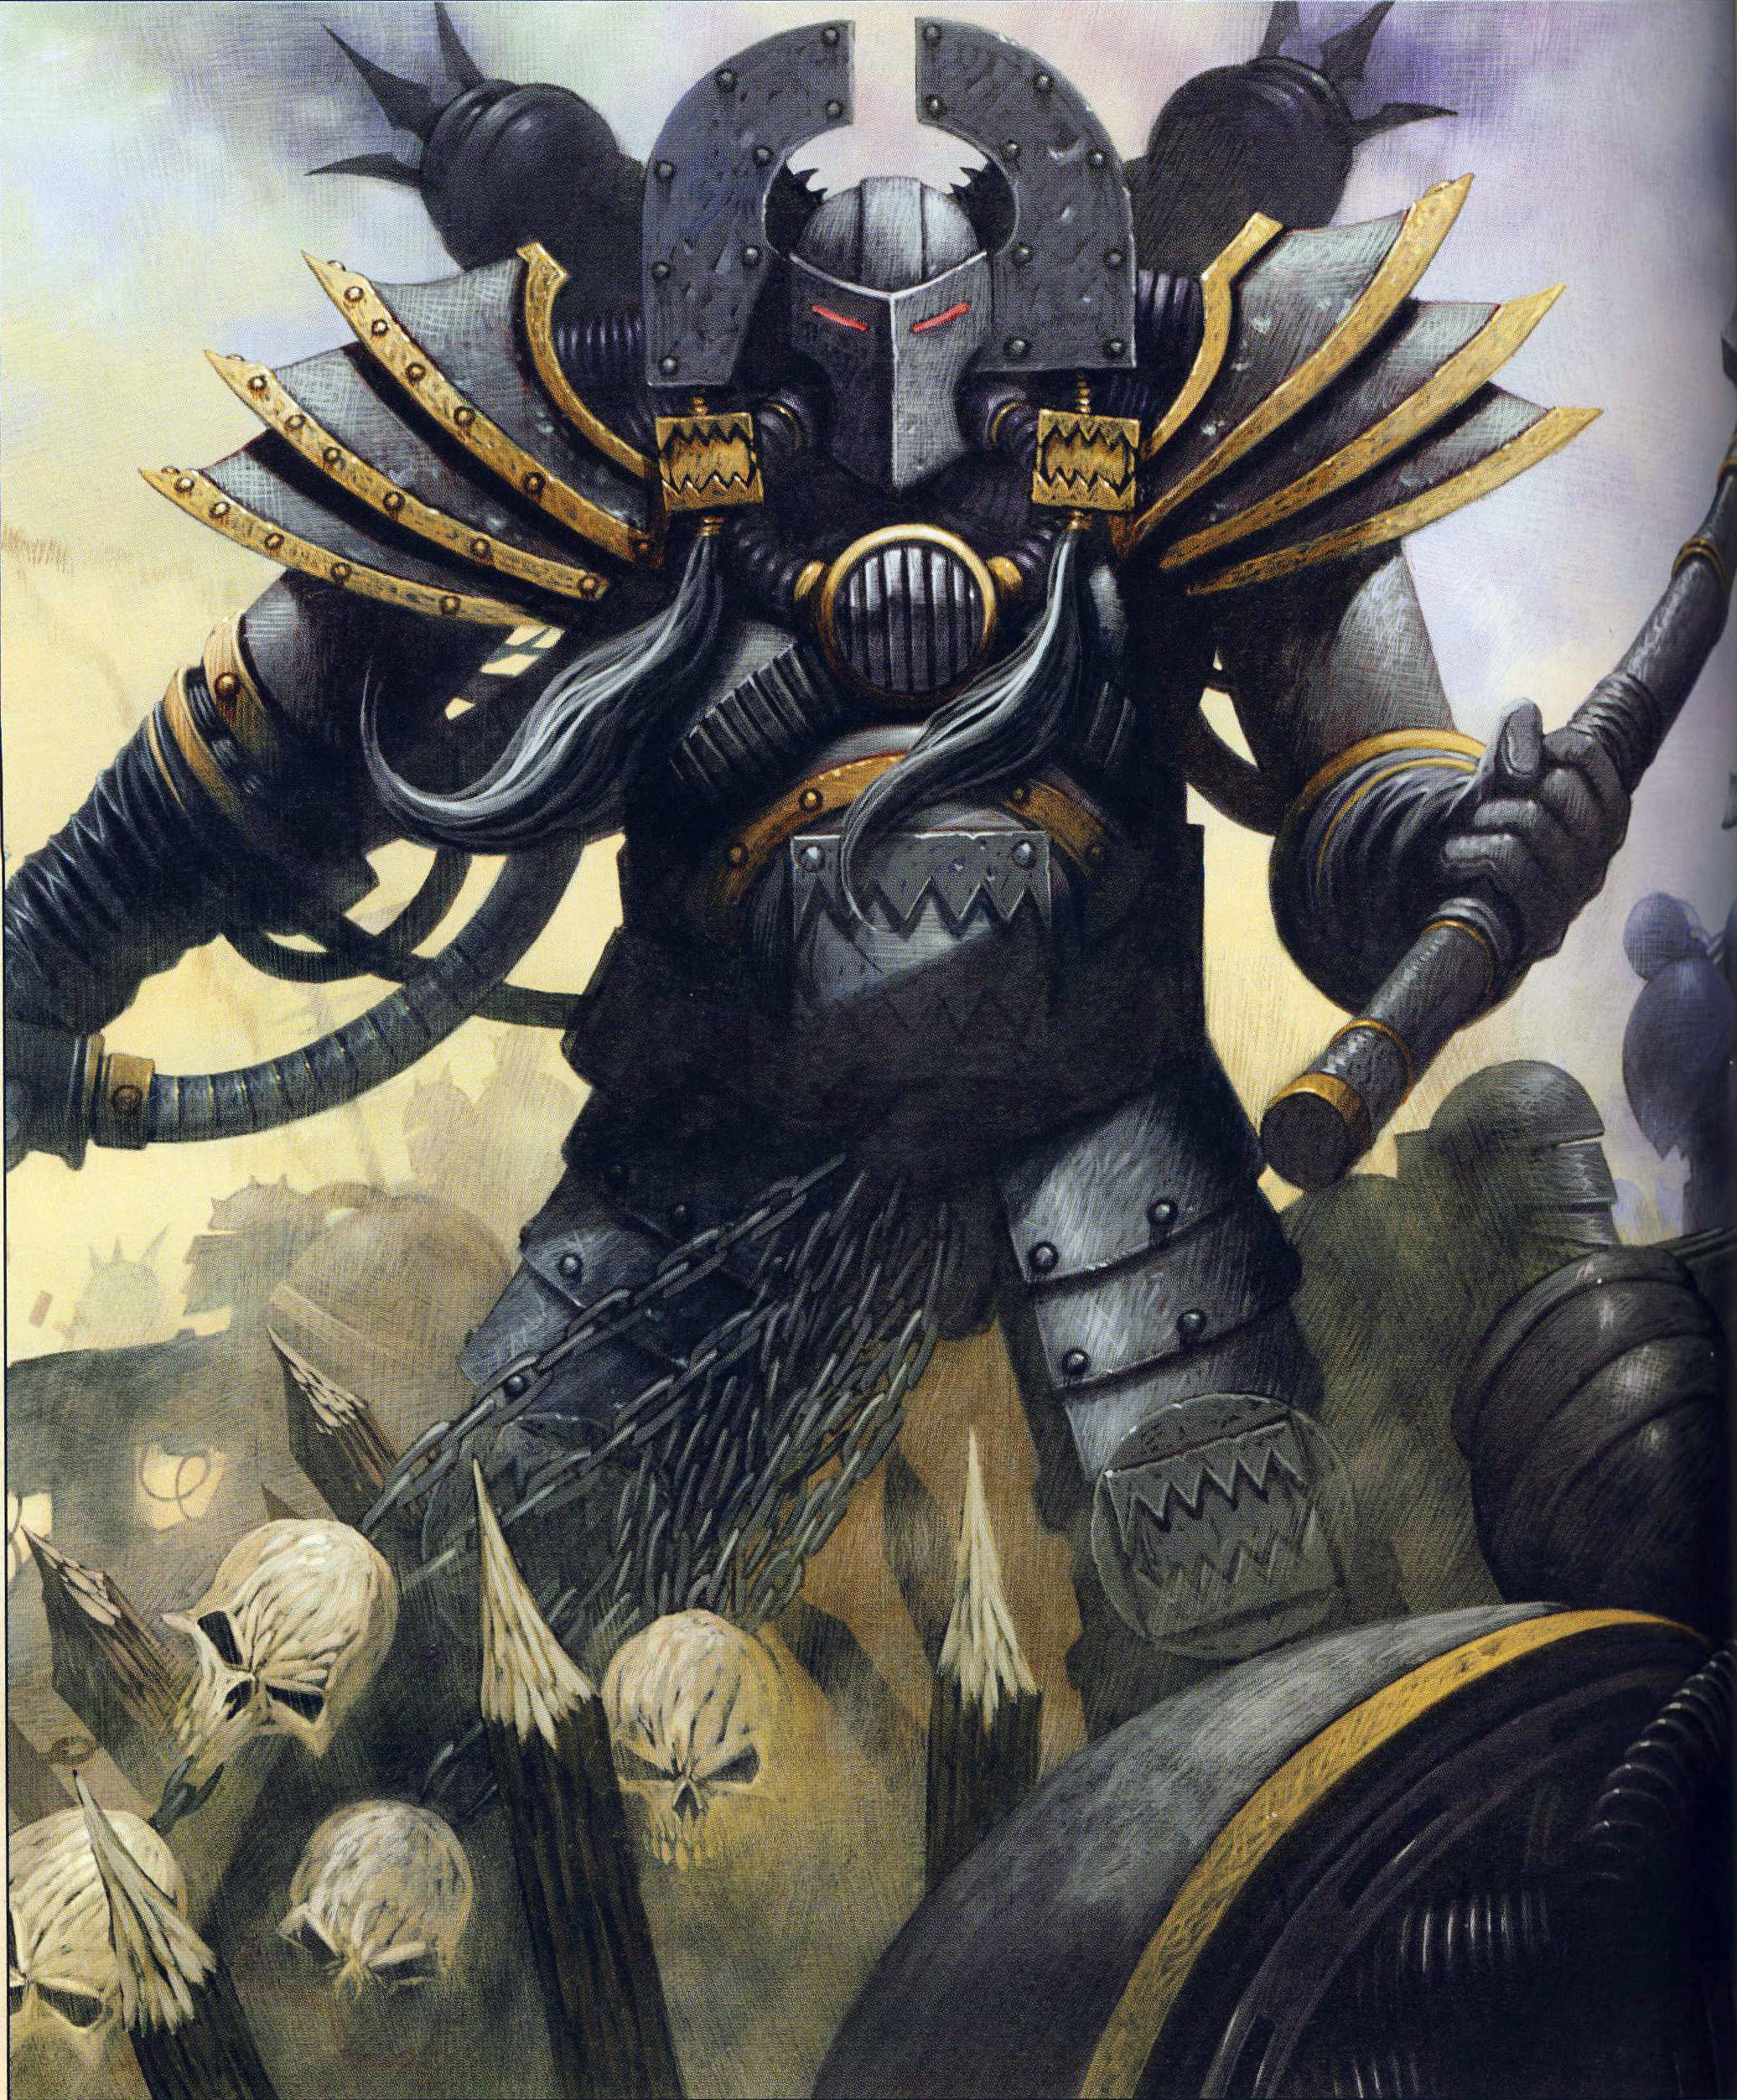 Kharn (not quite yet the Betrayer) Horus Heresy card art